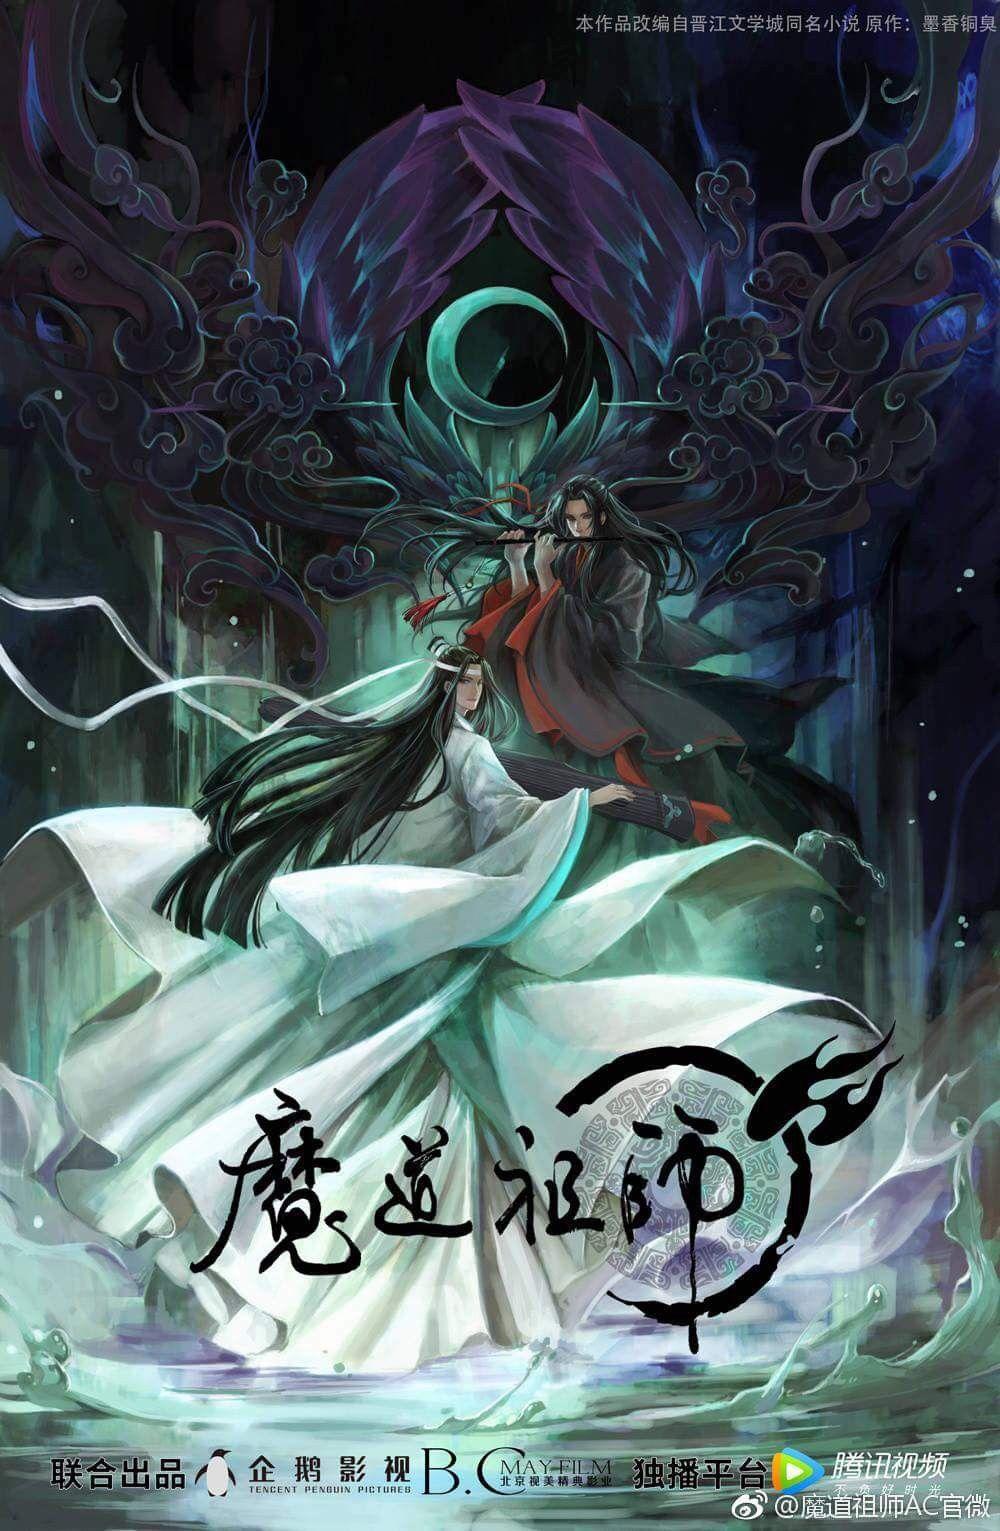 Pin by blue mermaid on [Cổ Trang] Nam 2 Anime, Cosplay